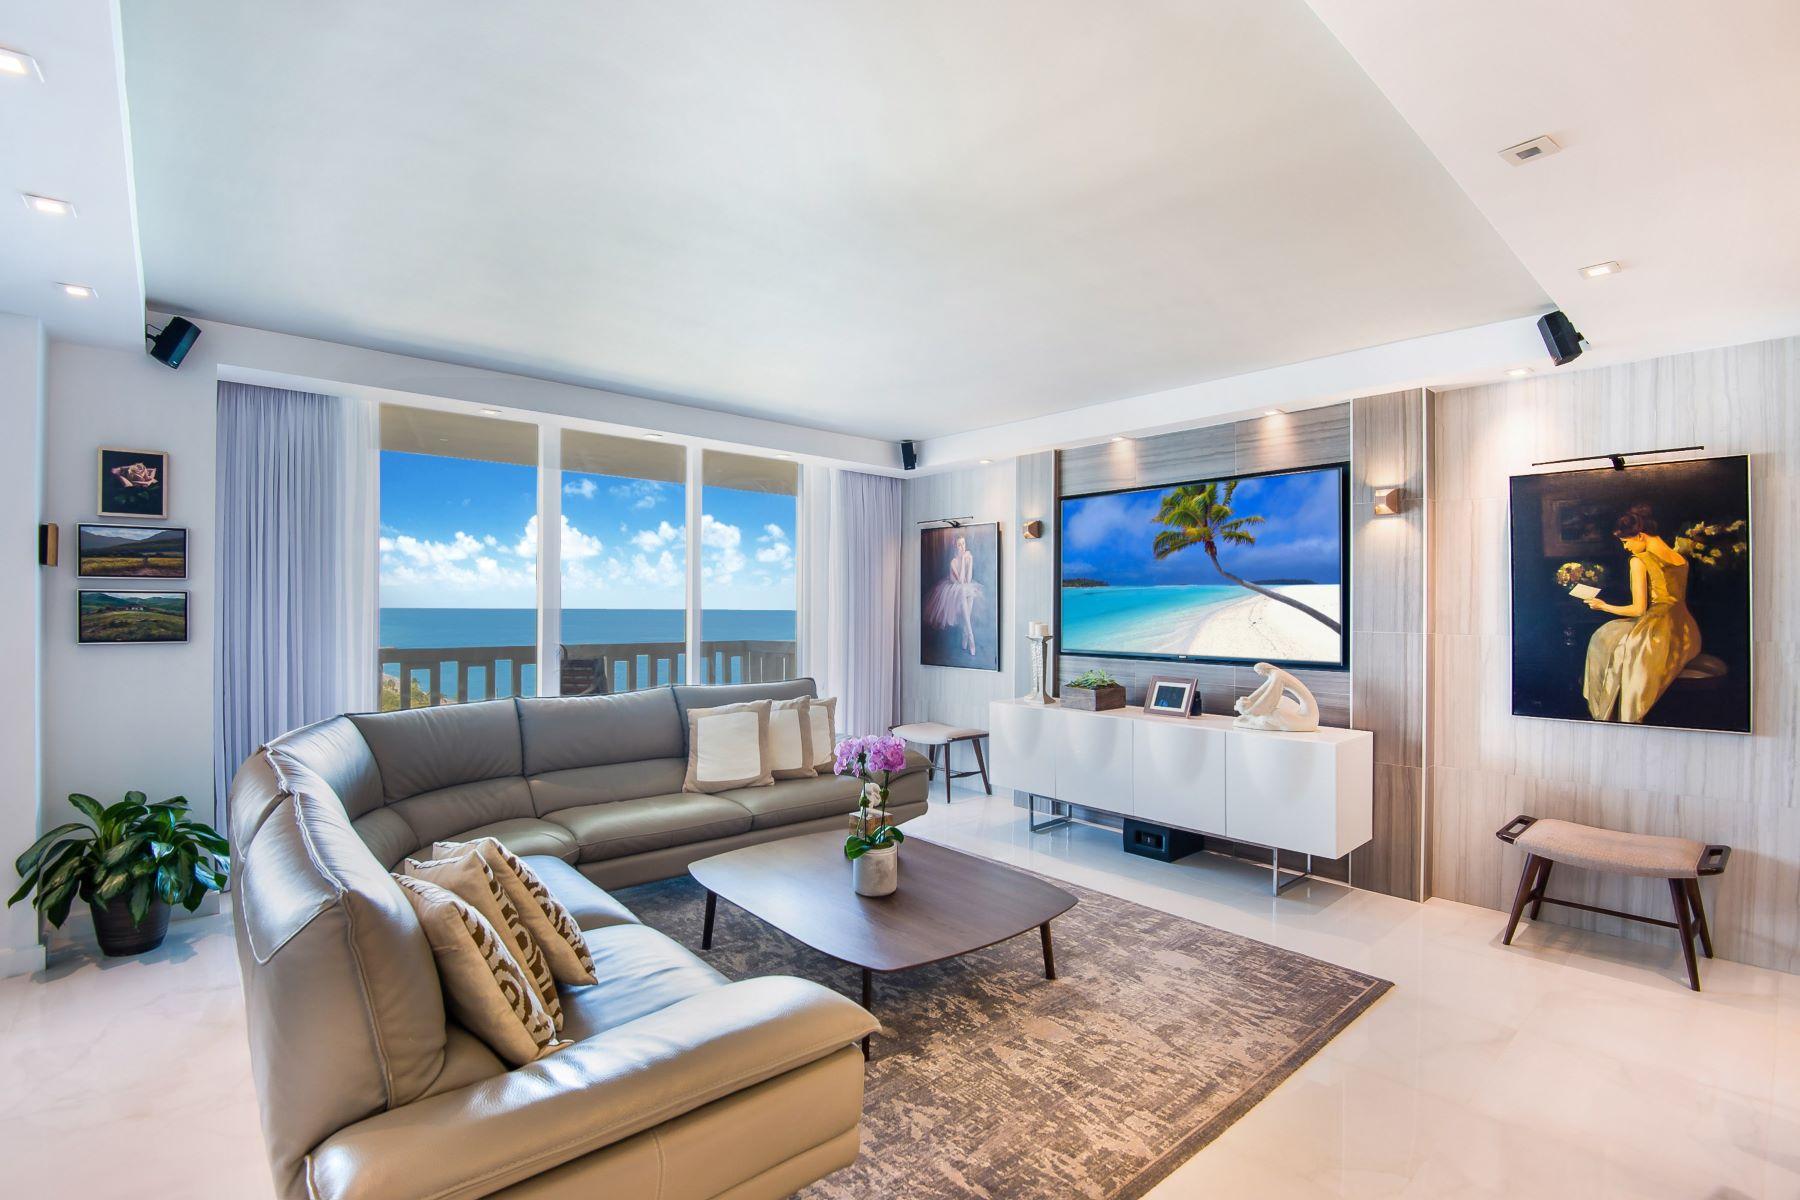 Condominiums 为 销售 在 Balmoral 20C 9801 Collins Ave 20C Ocean 保罗哈港, 佛罗里达州 33154 美国